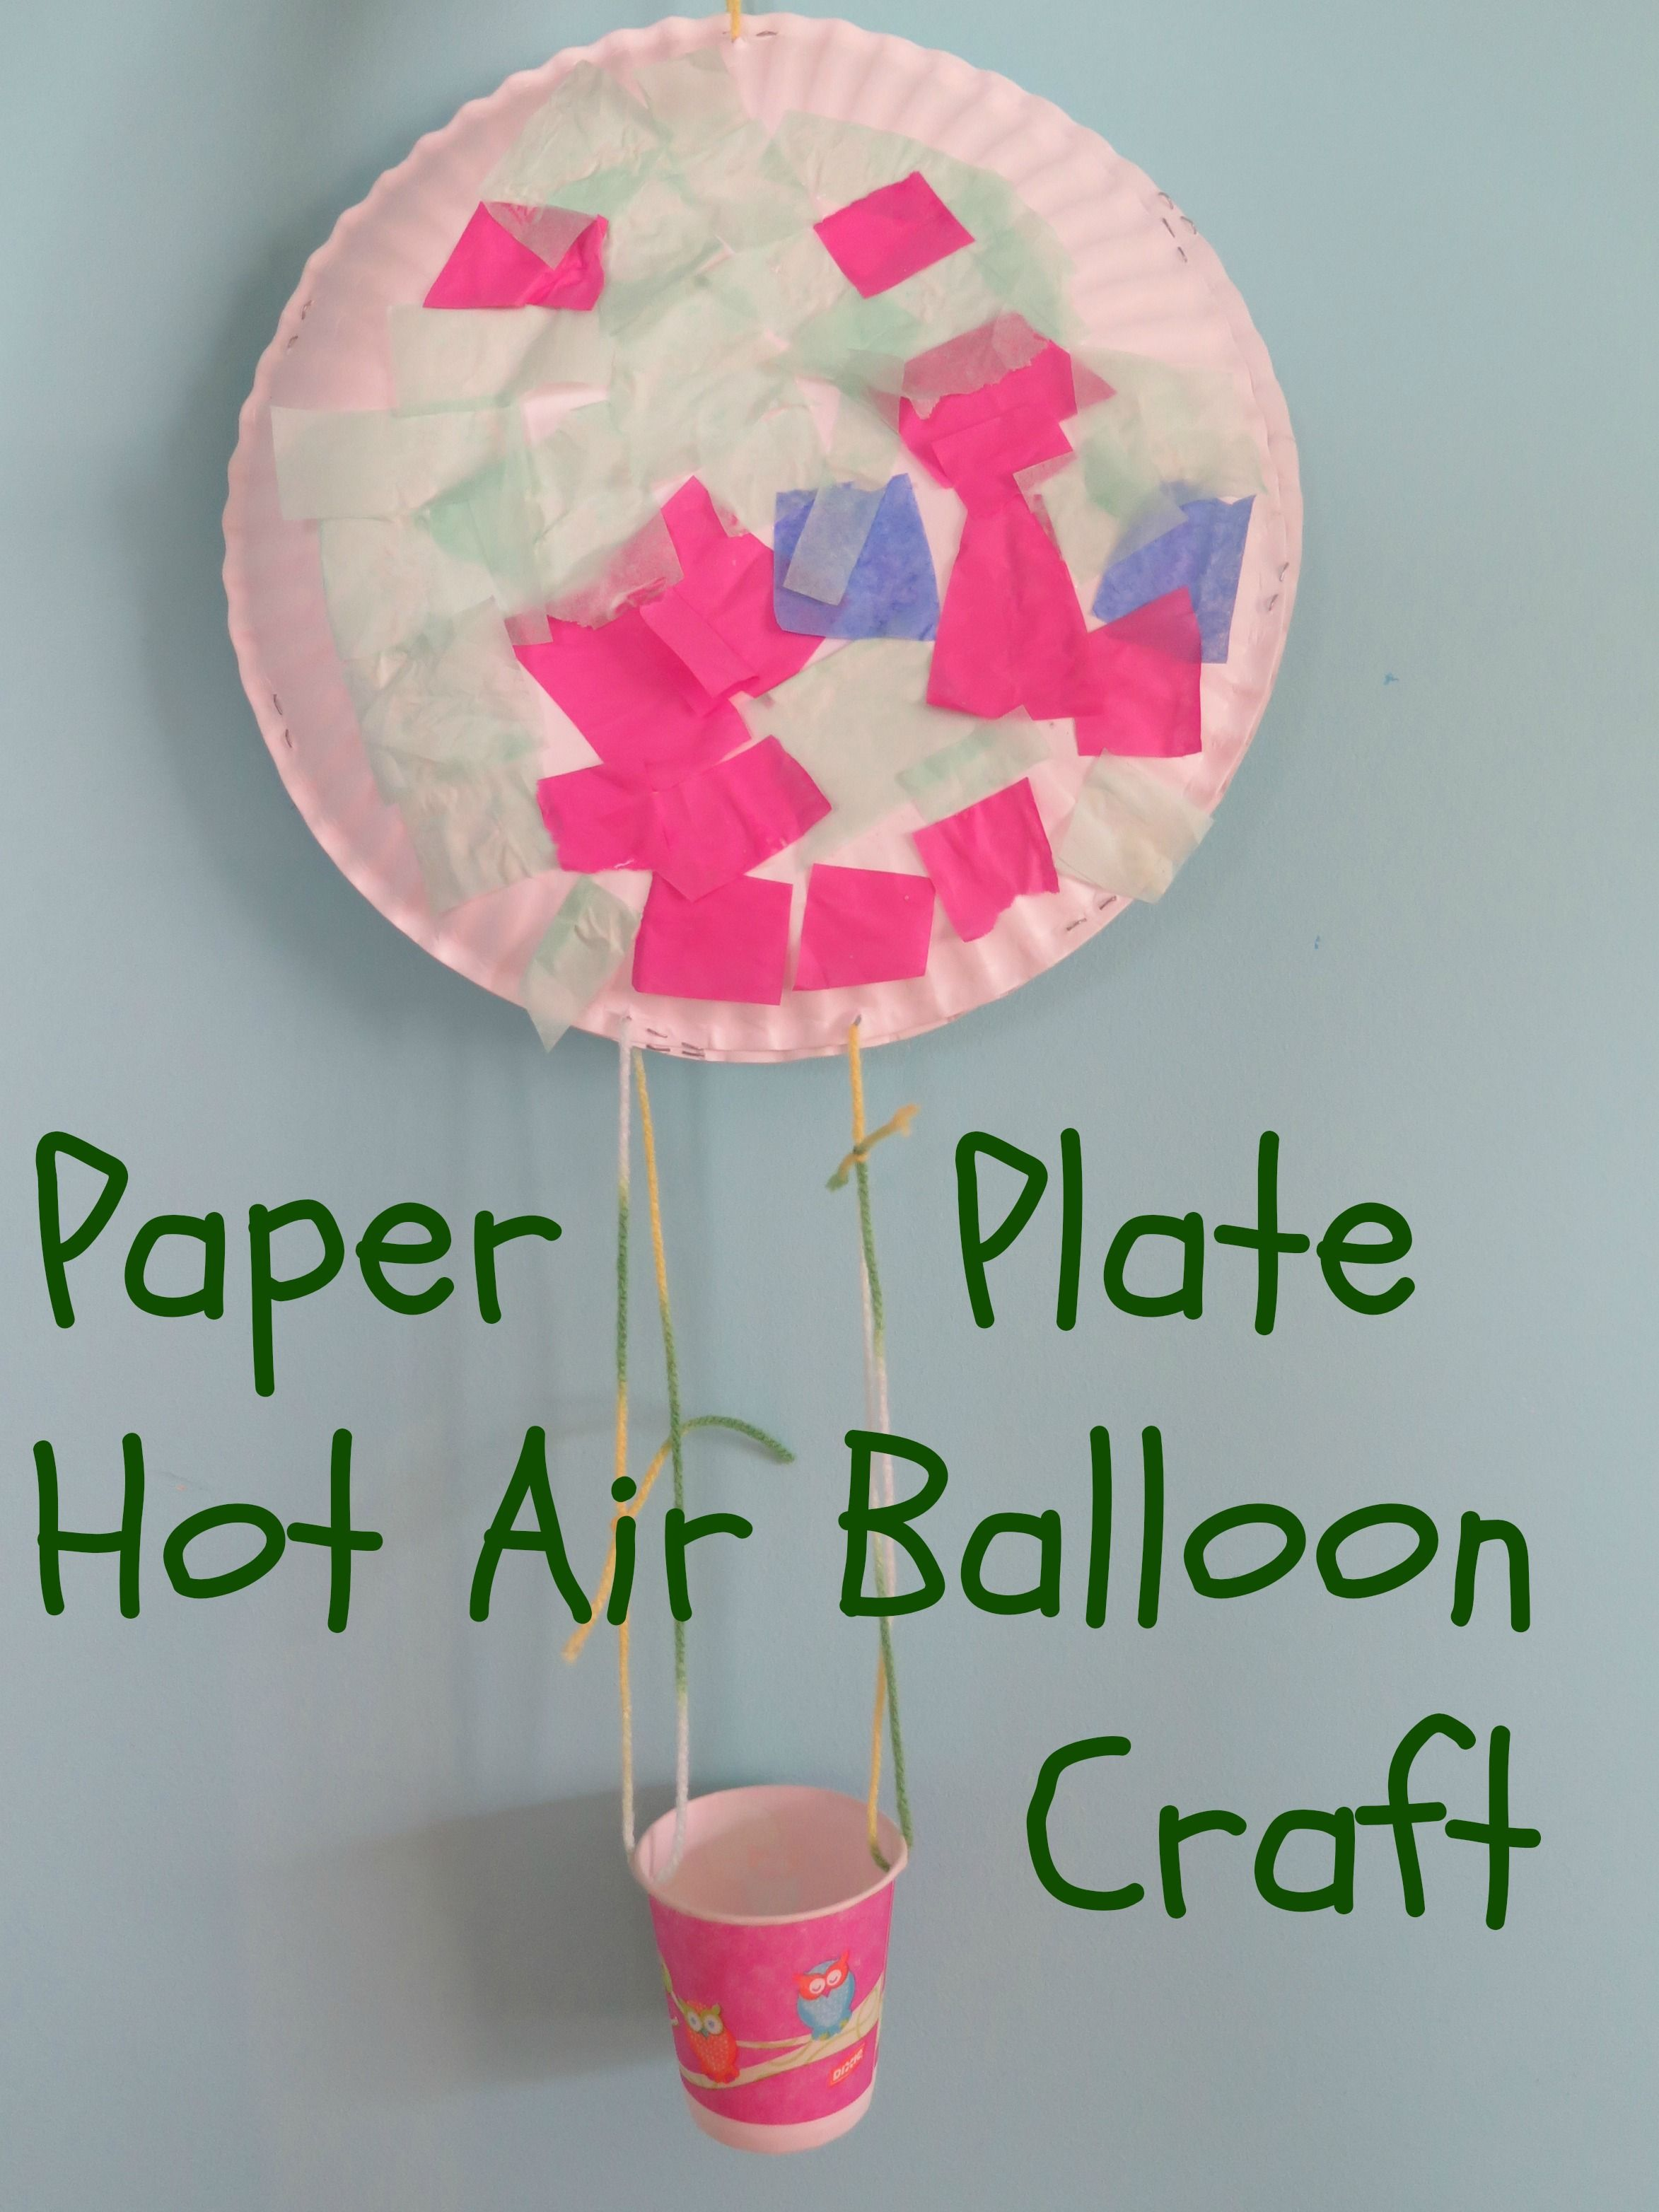 Paper Plate Hot Air Balloon Craft